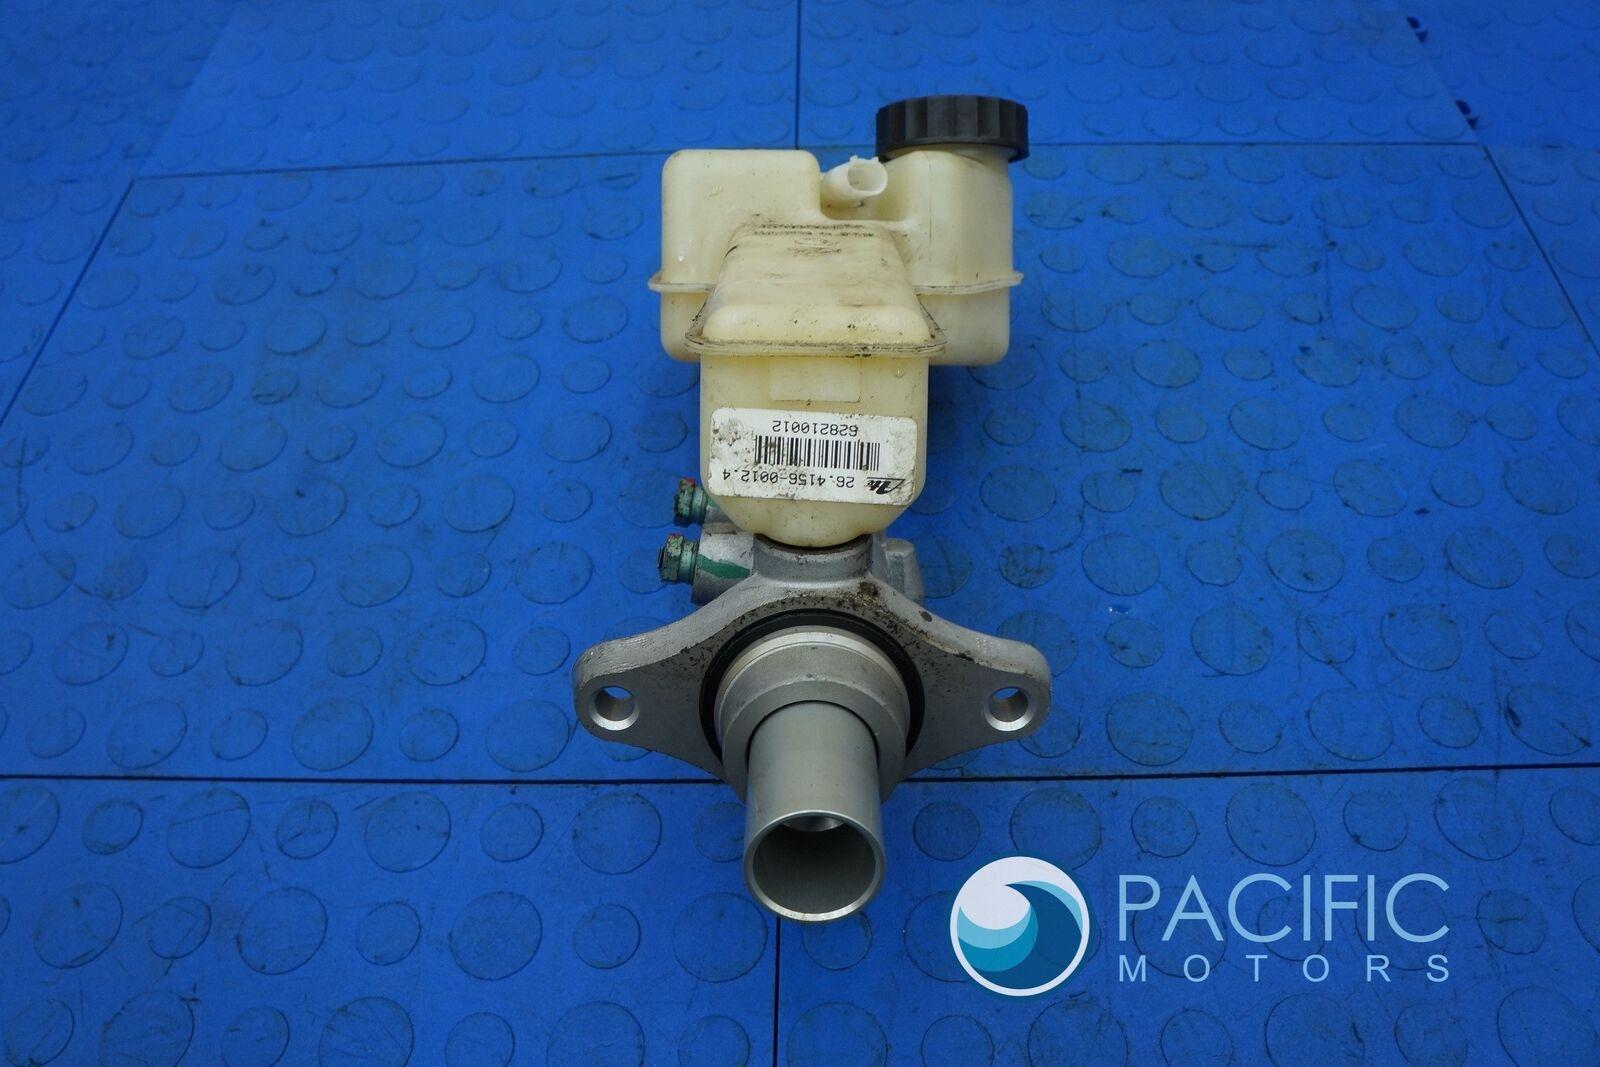 Mercedes ML Brake Master Cylinder W164 Ml 320 CDi V6 Brake Master Cylinder 2006